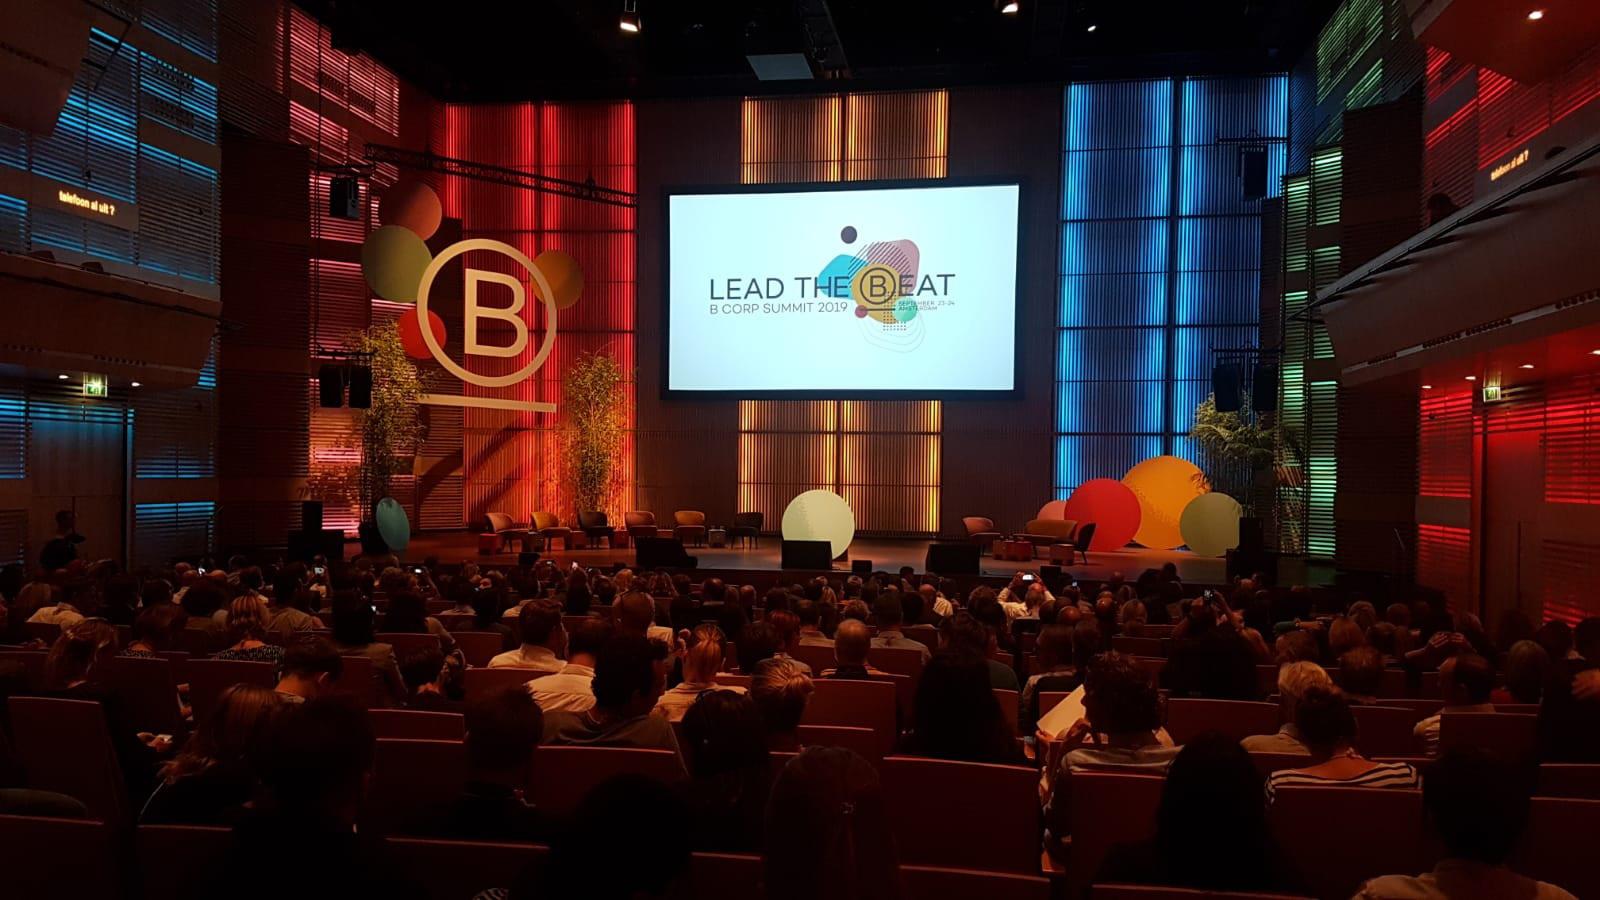 B Corp Summit